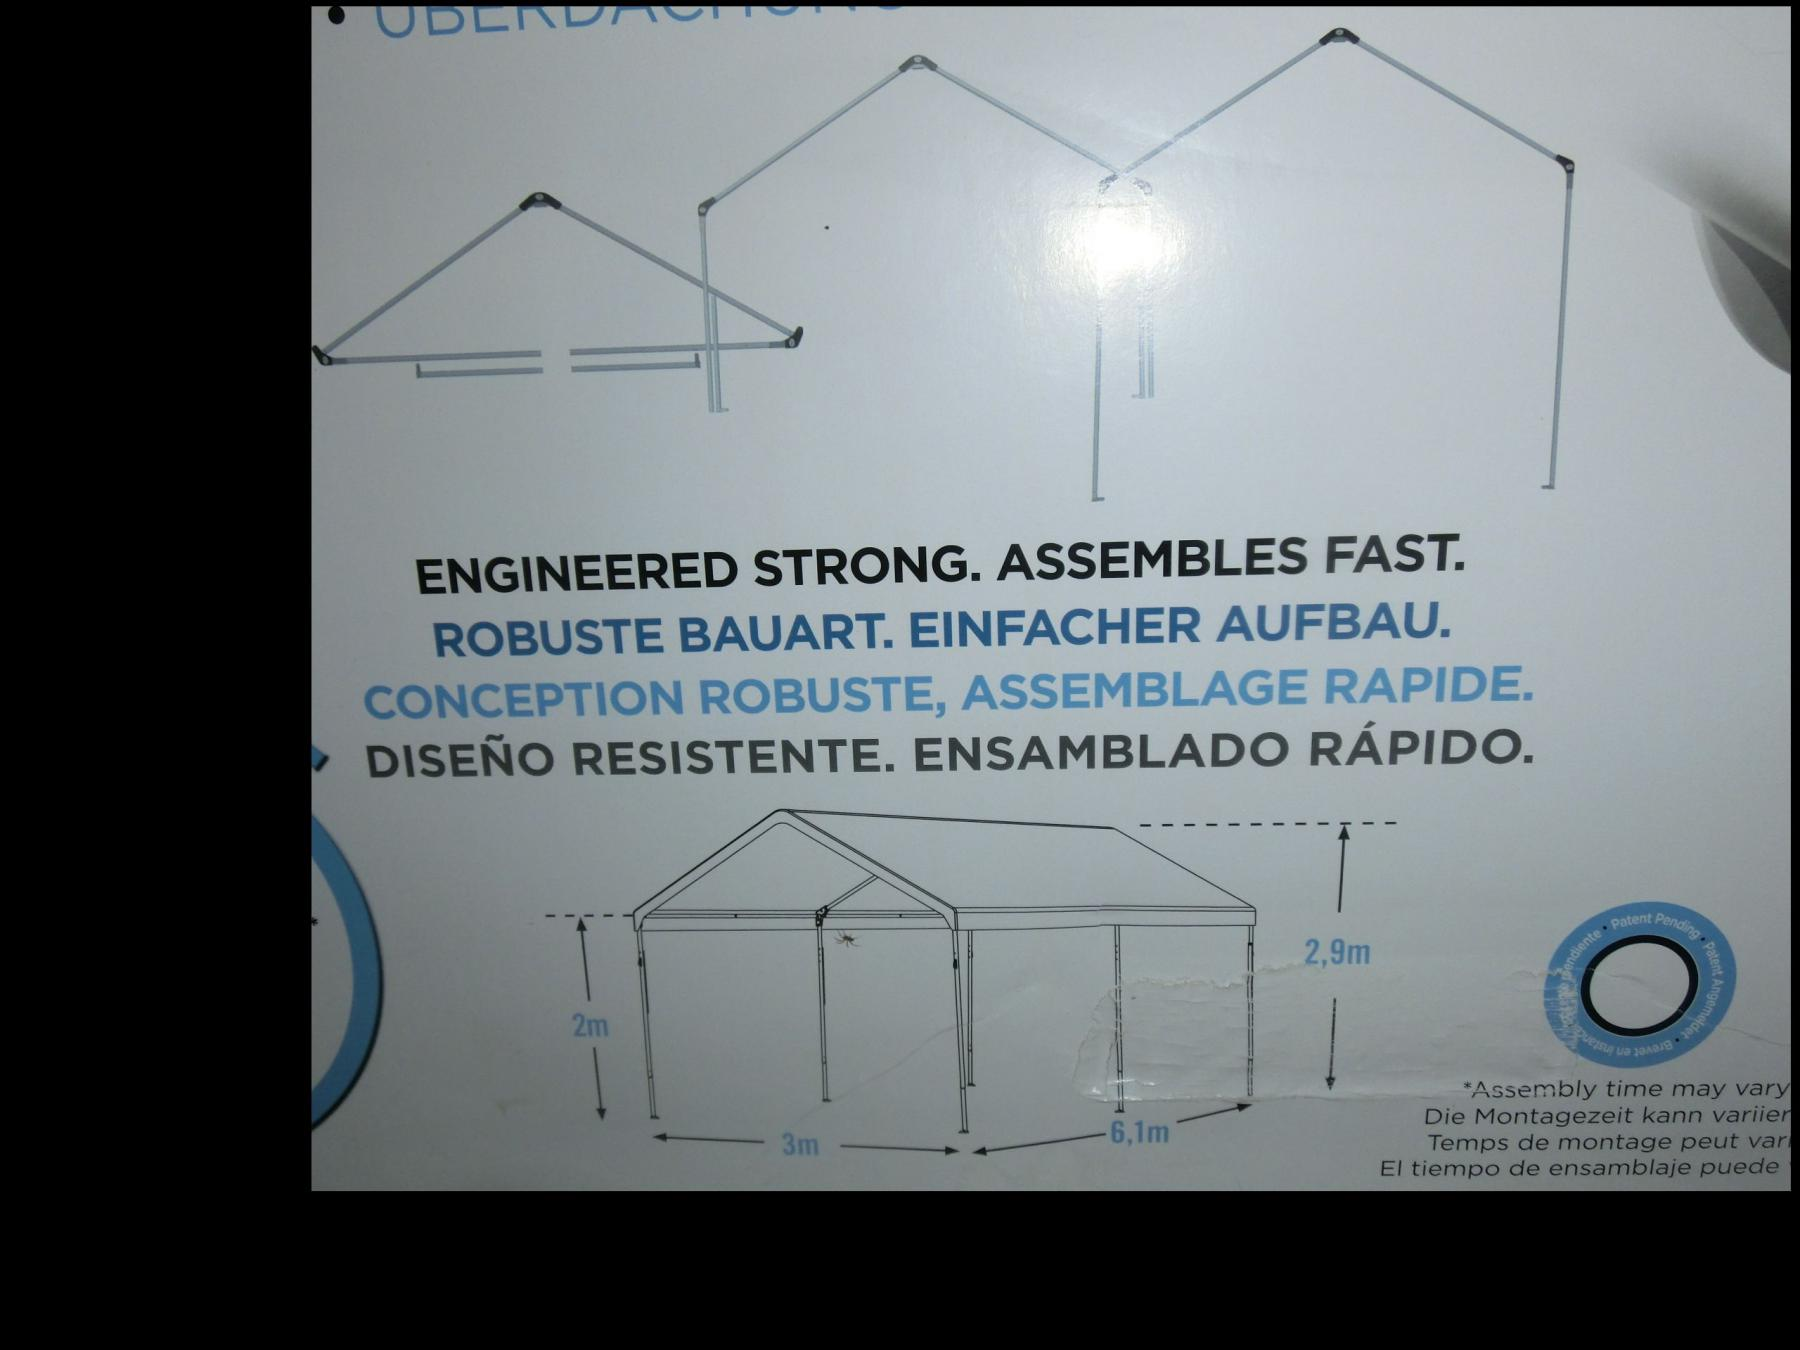 XL Profi Faltpavillon Marktstand 6m x 3m x 2,9m weiss wasserdicht Seitenteile